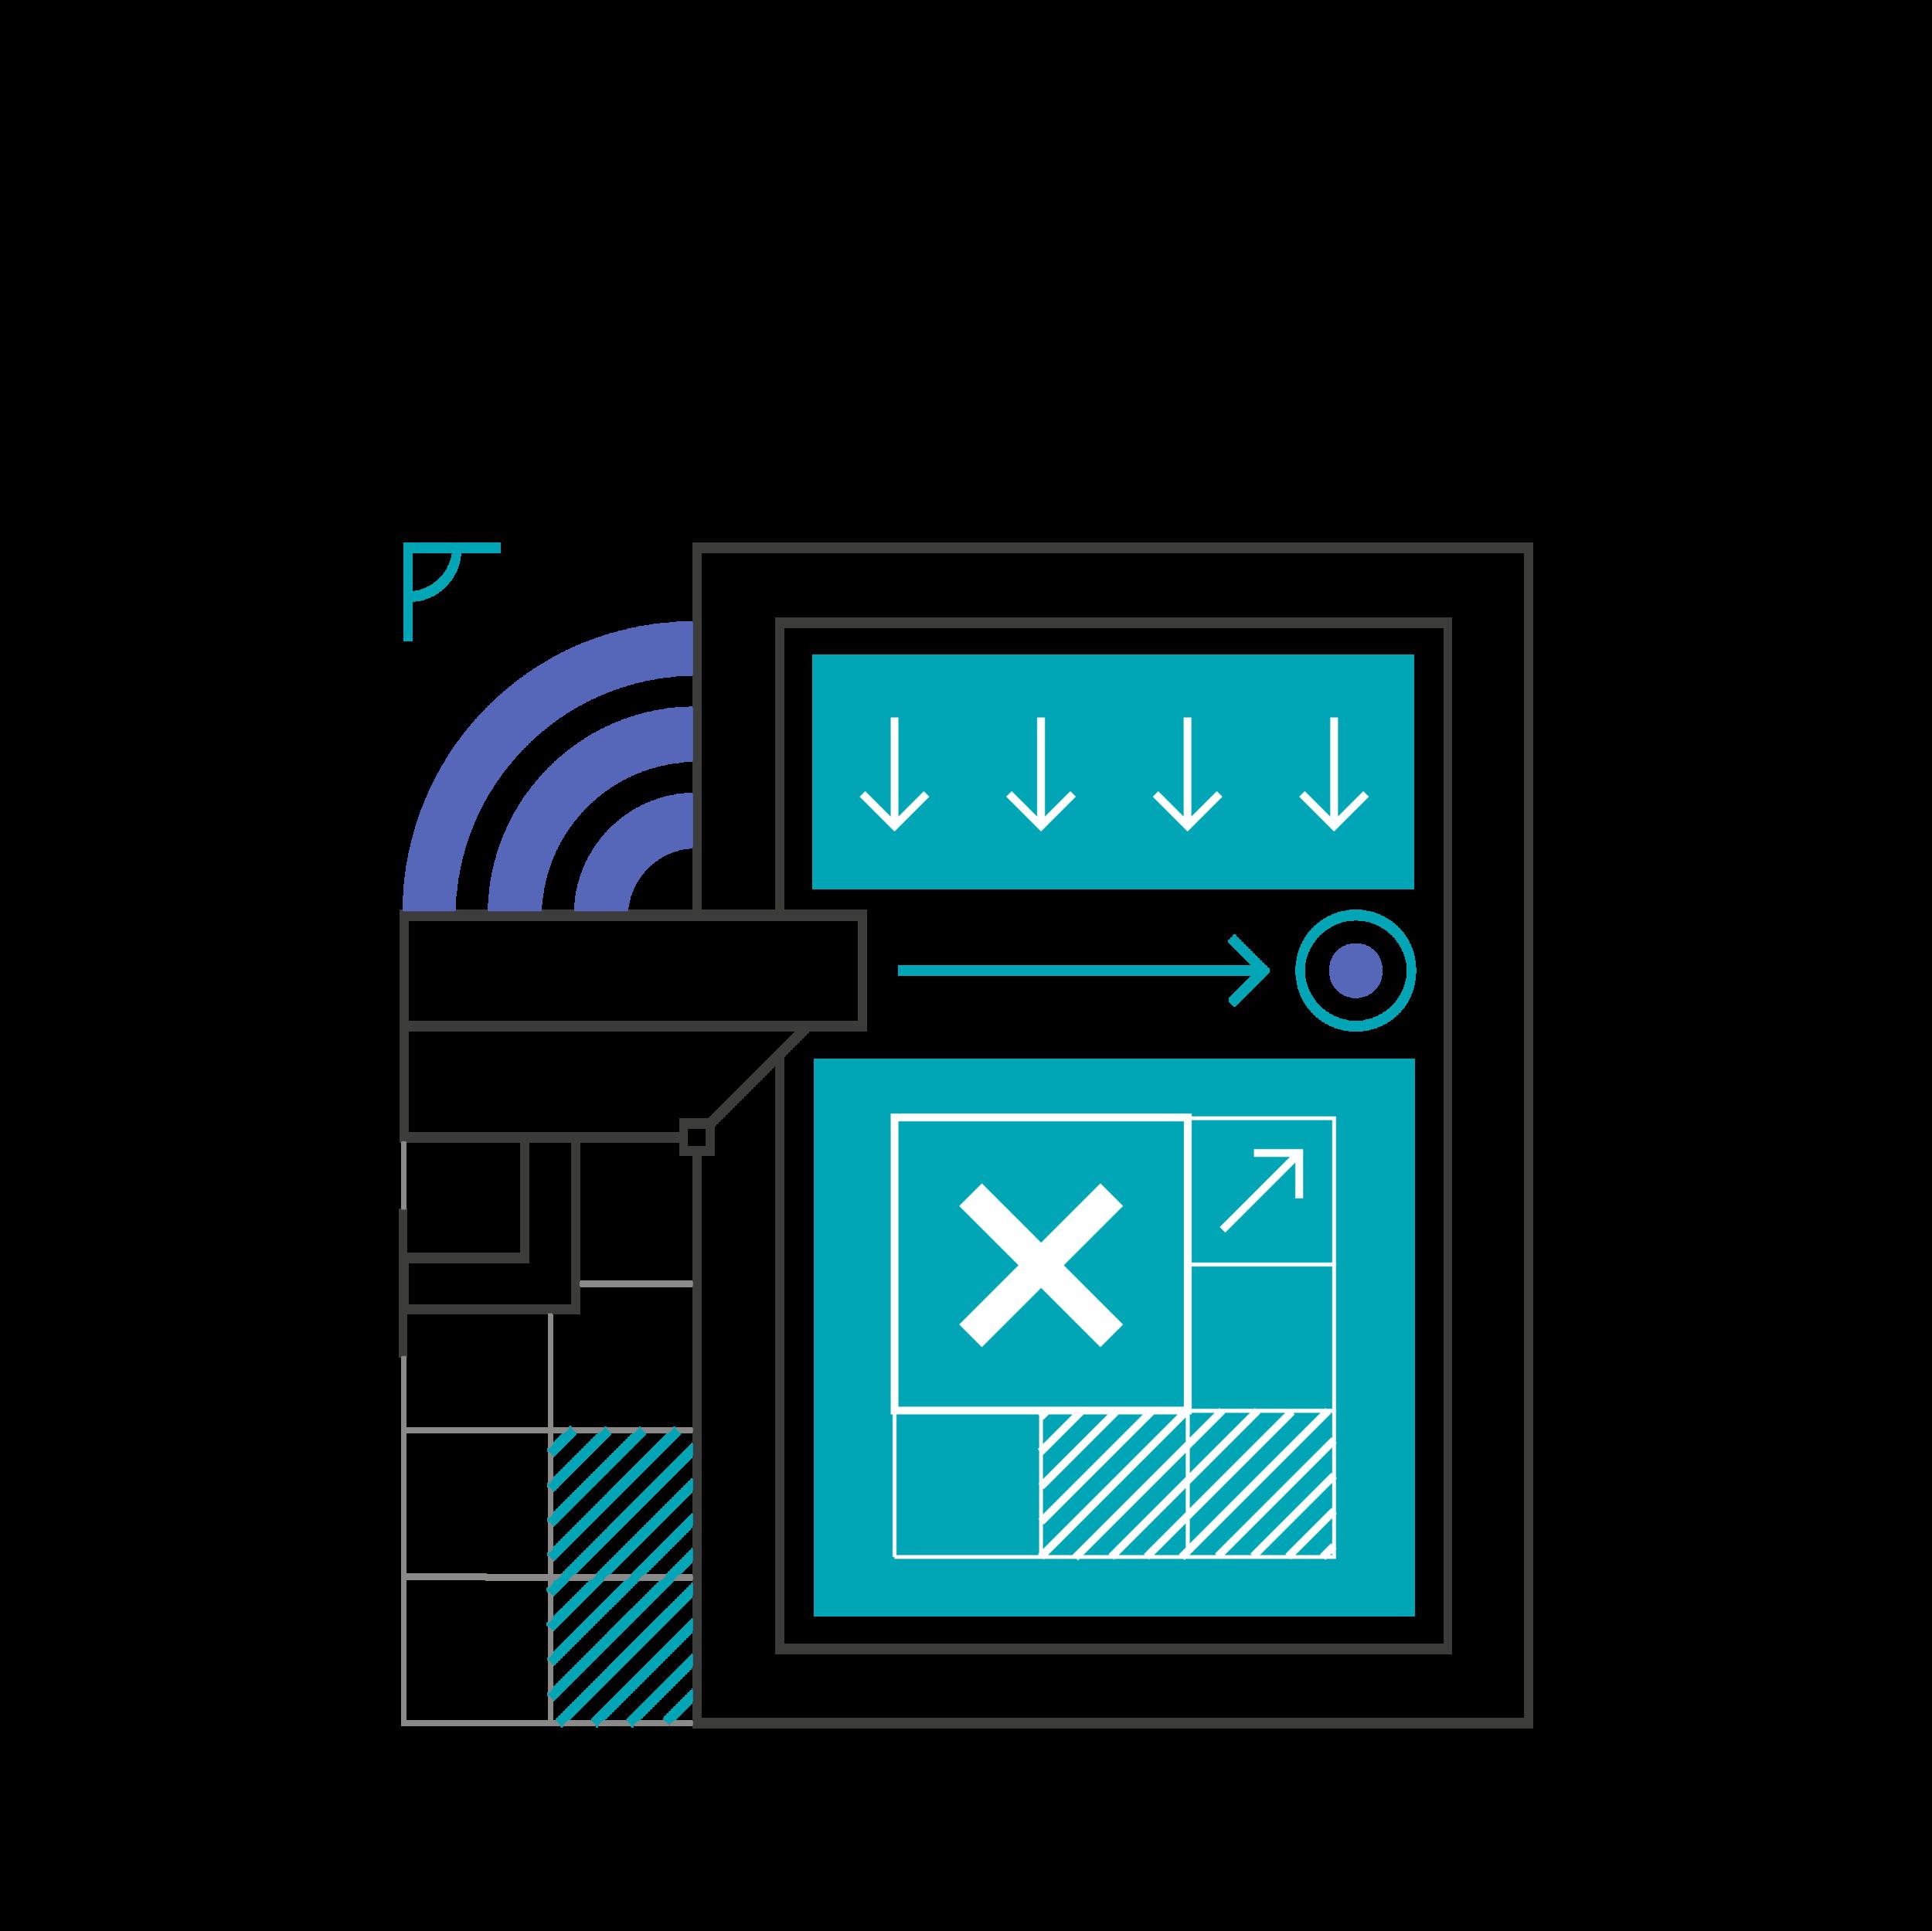 Autepra_web_ikonos_Gate operating system copy.png